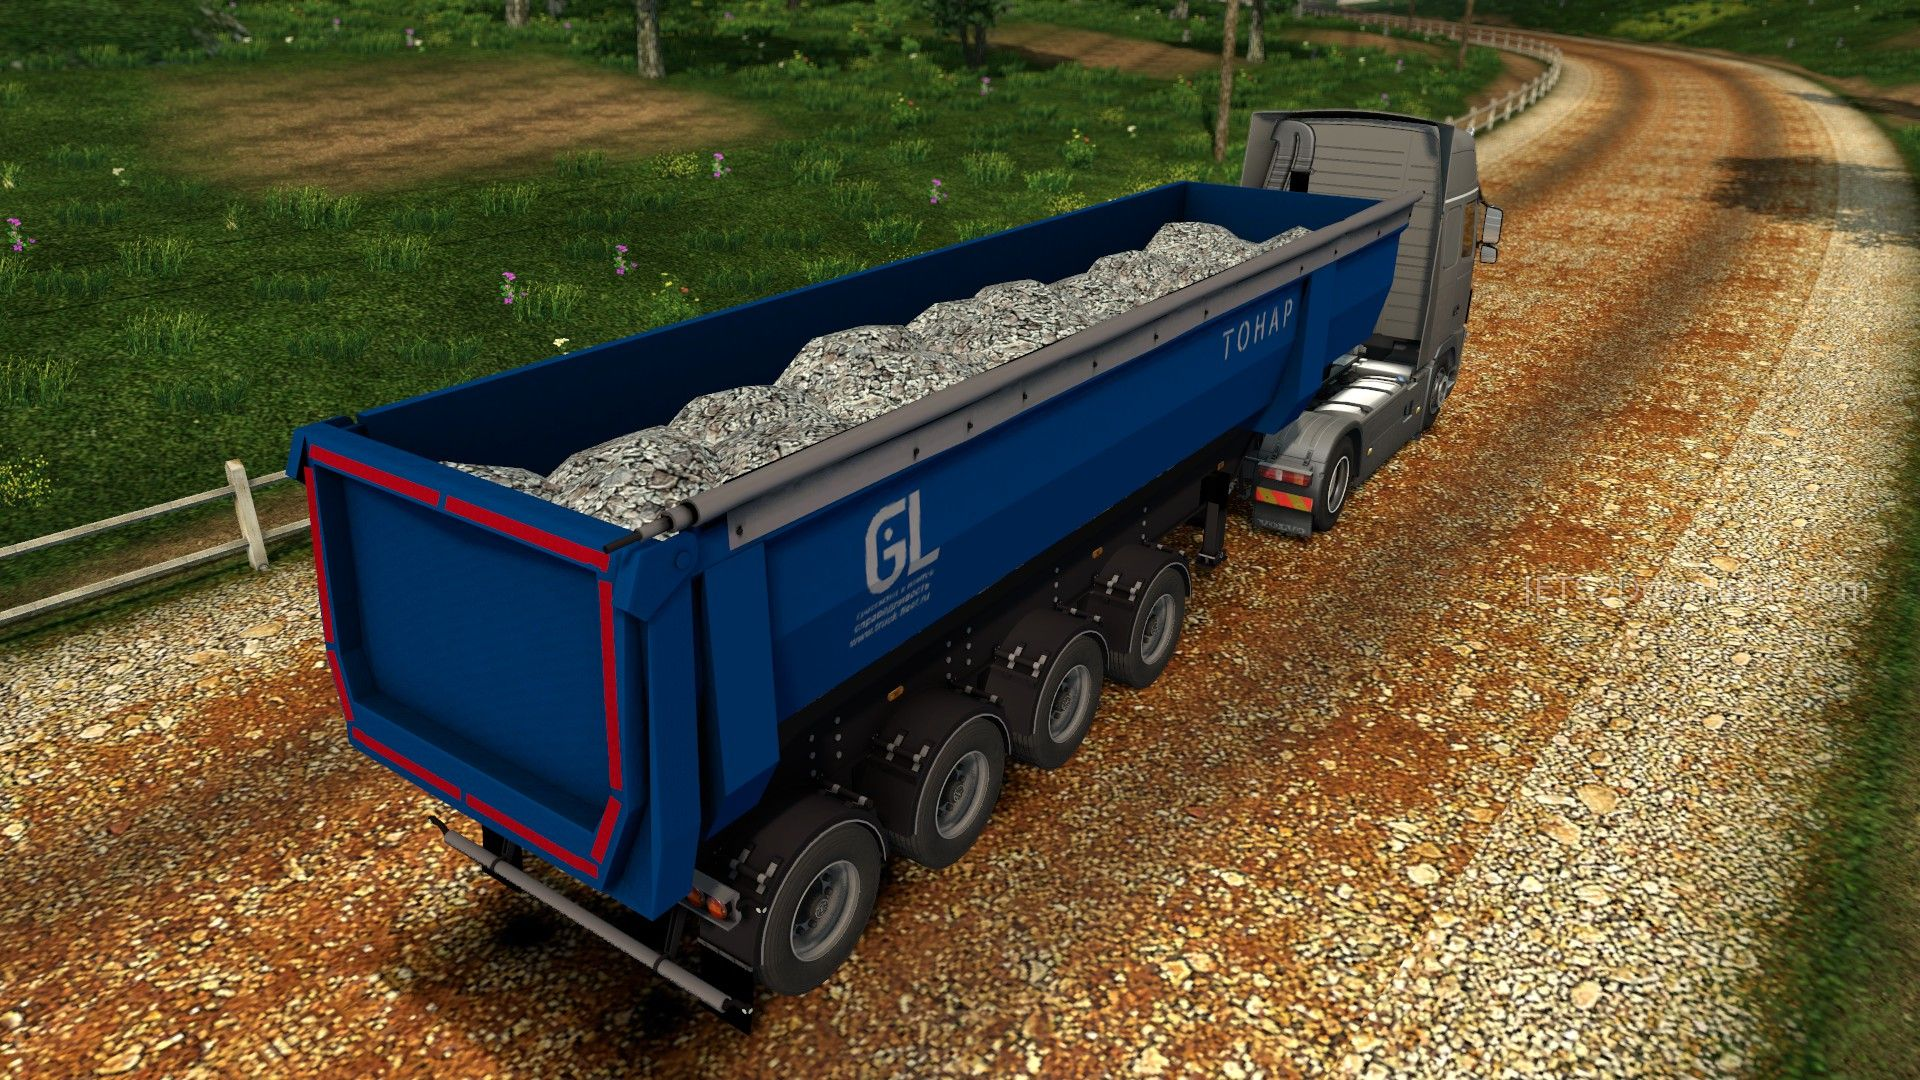 tonar-95234-trailer-3